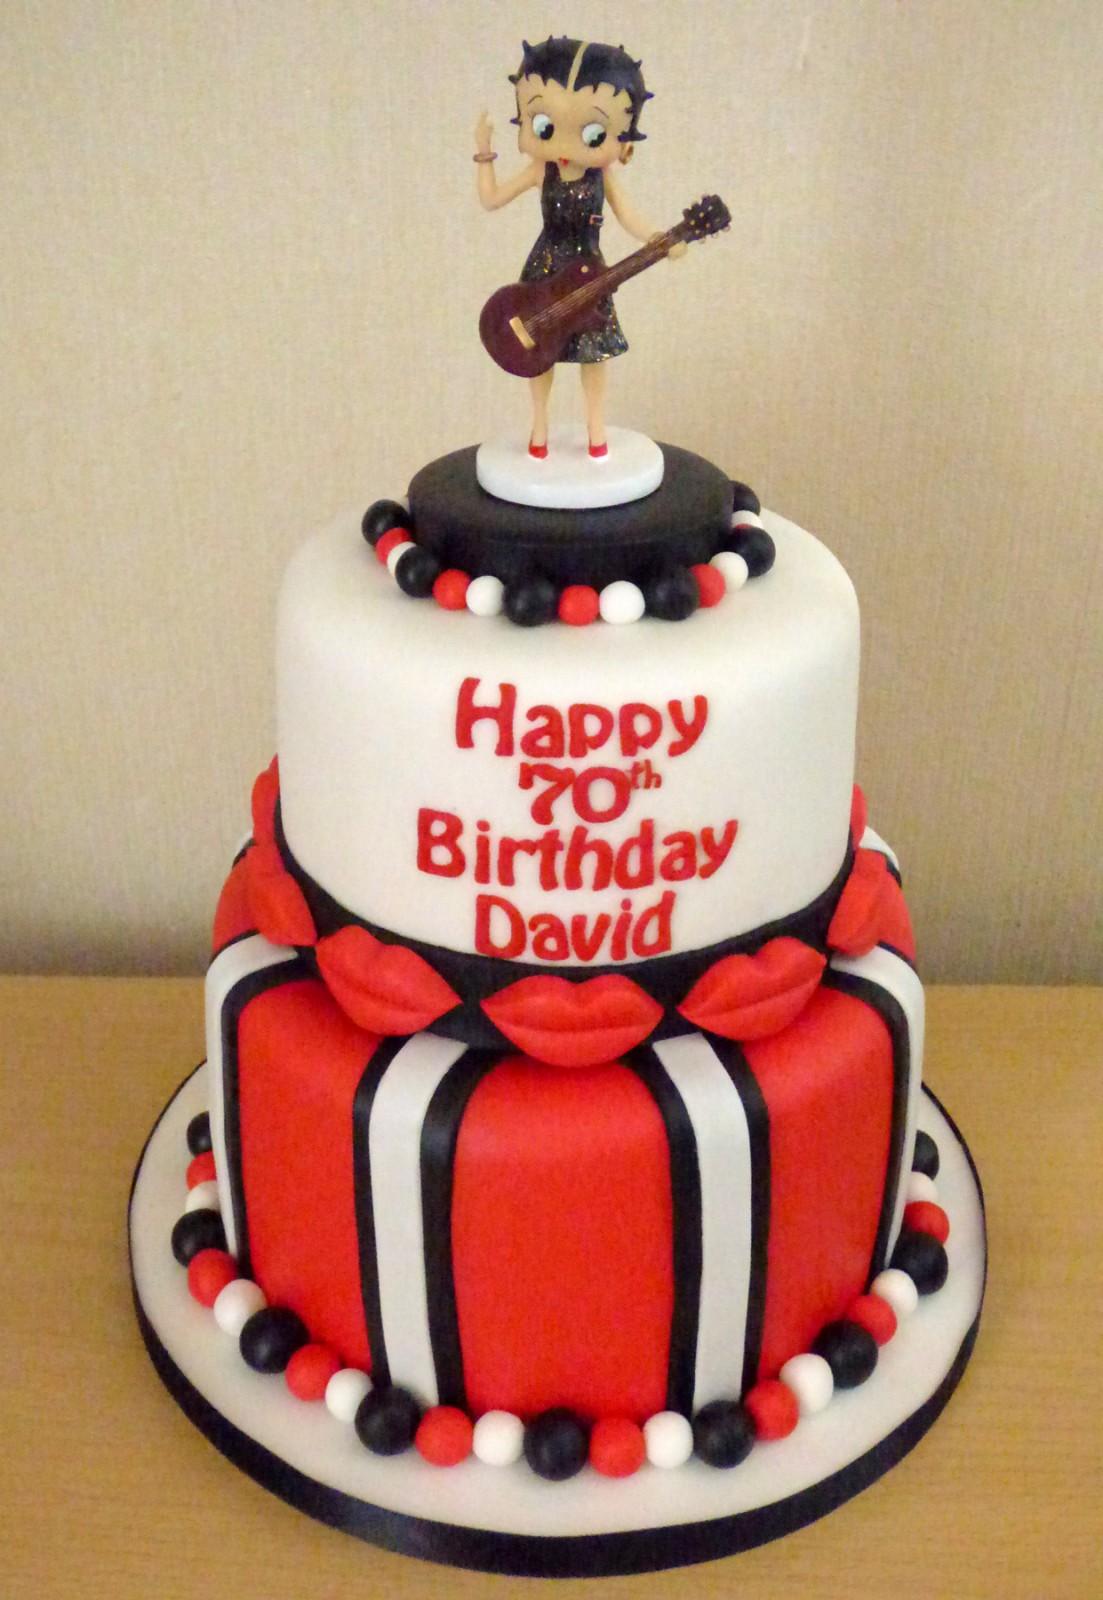 Tremendous Betty Boop Inspired Birthday Cake Susies Cakes Personalised Birthday Cards Veneteletsinfo